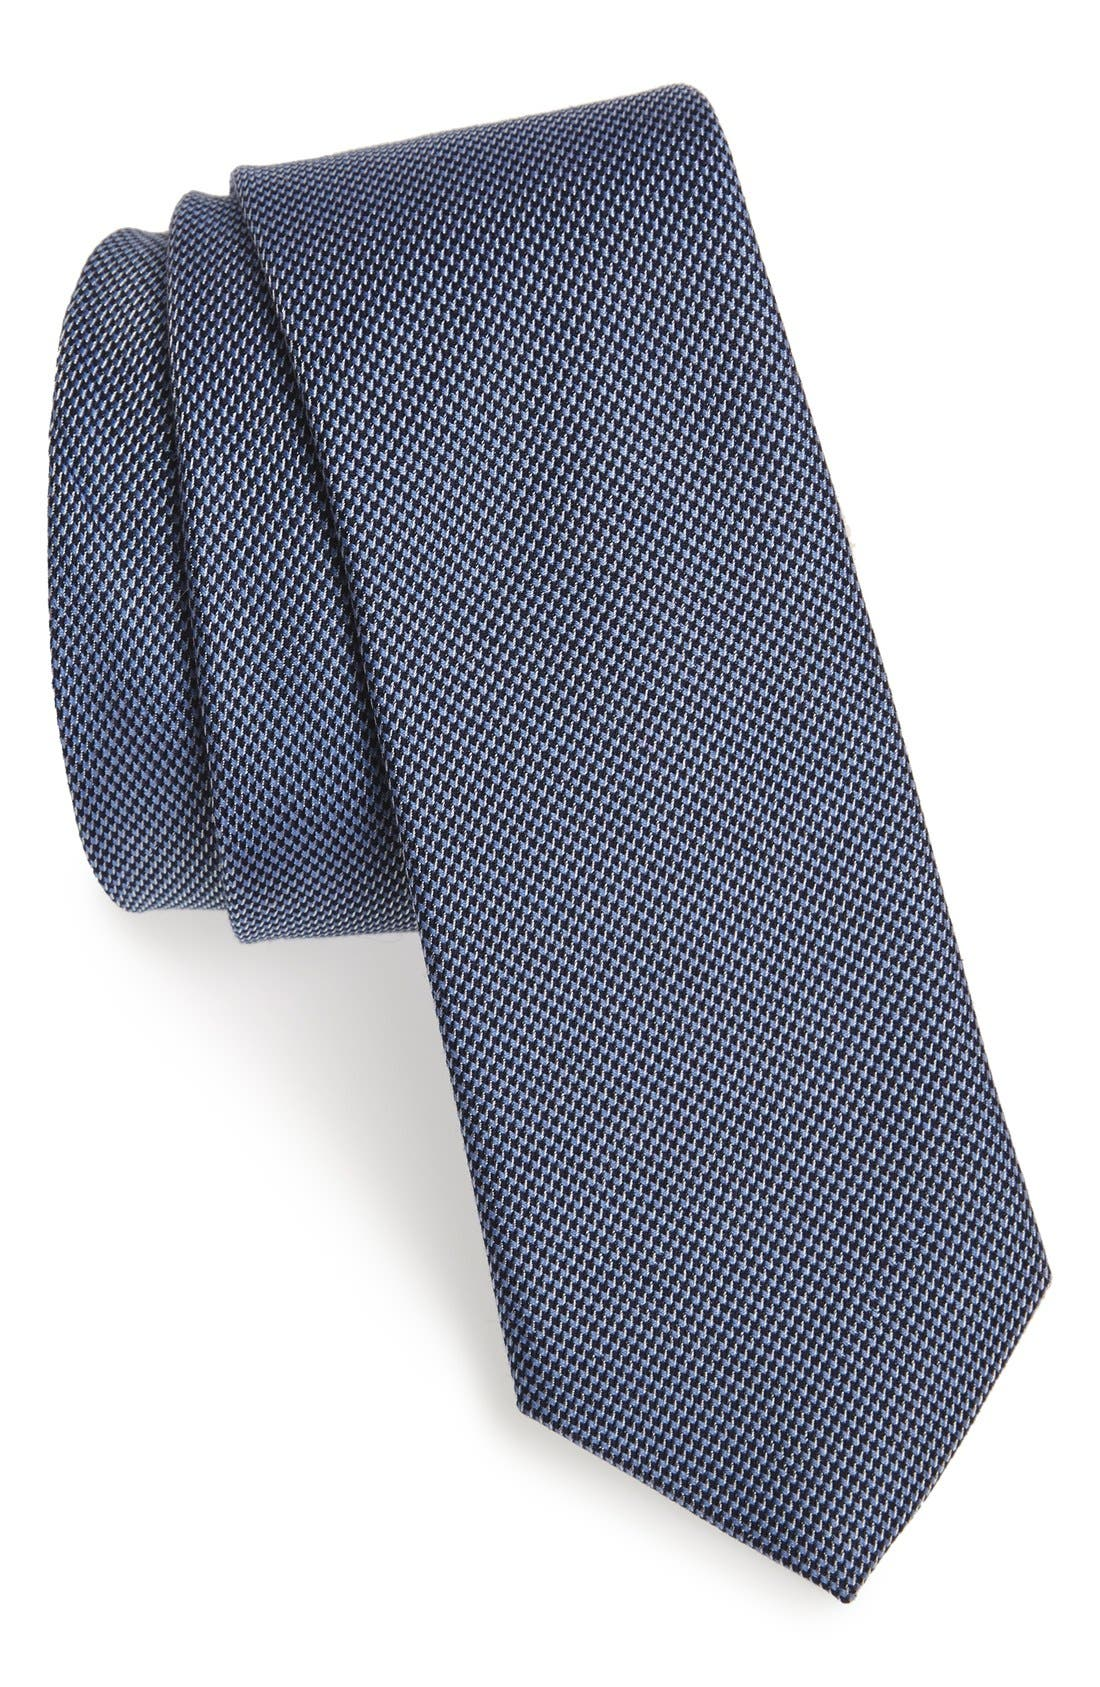 CALIBRATE Textured Cotton & Silk Tie